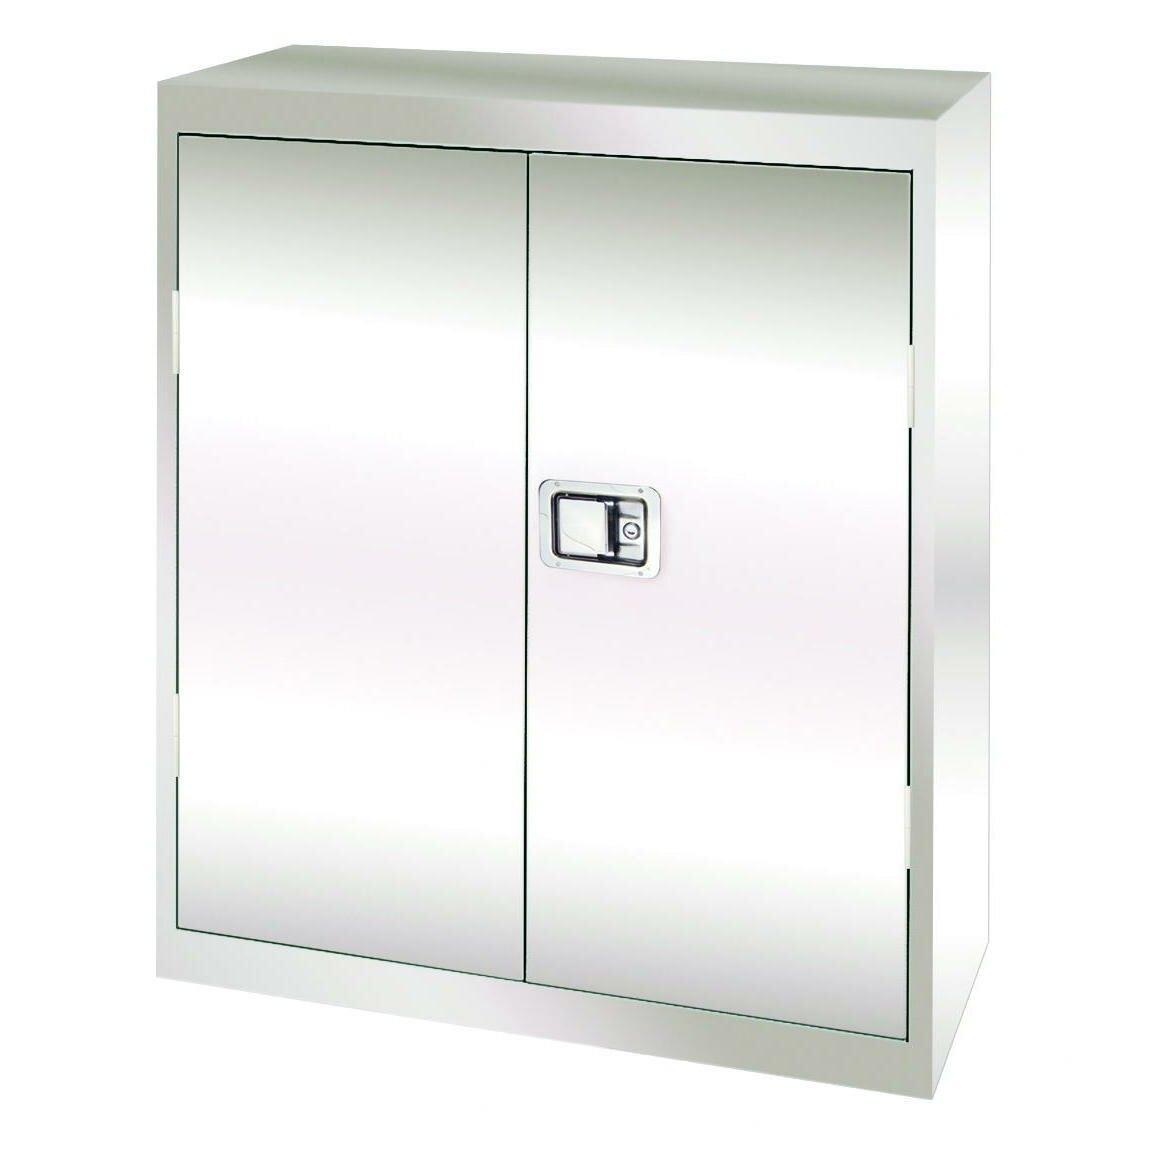 Stainless Steel 2 Door Storage Cabinet Wayfair Supply